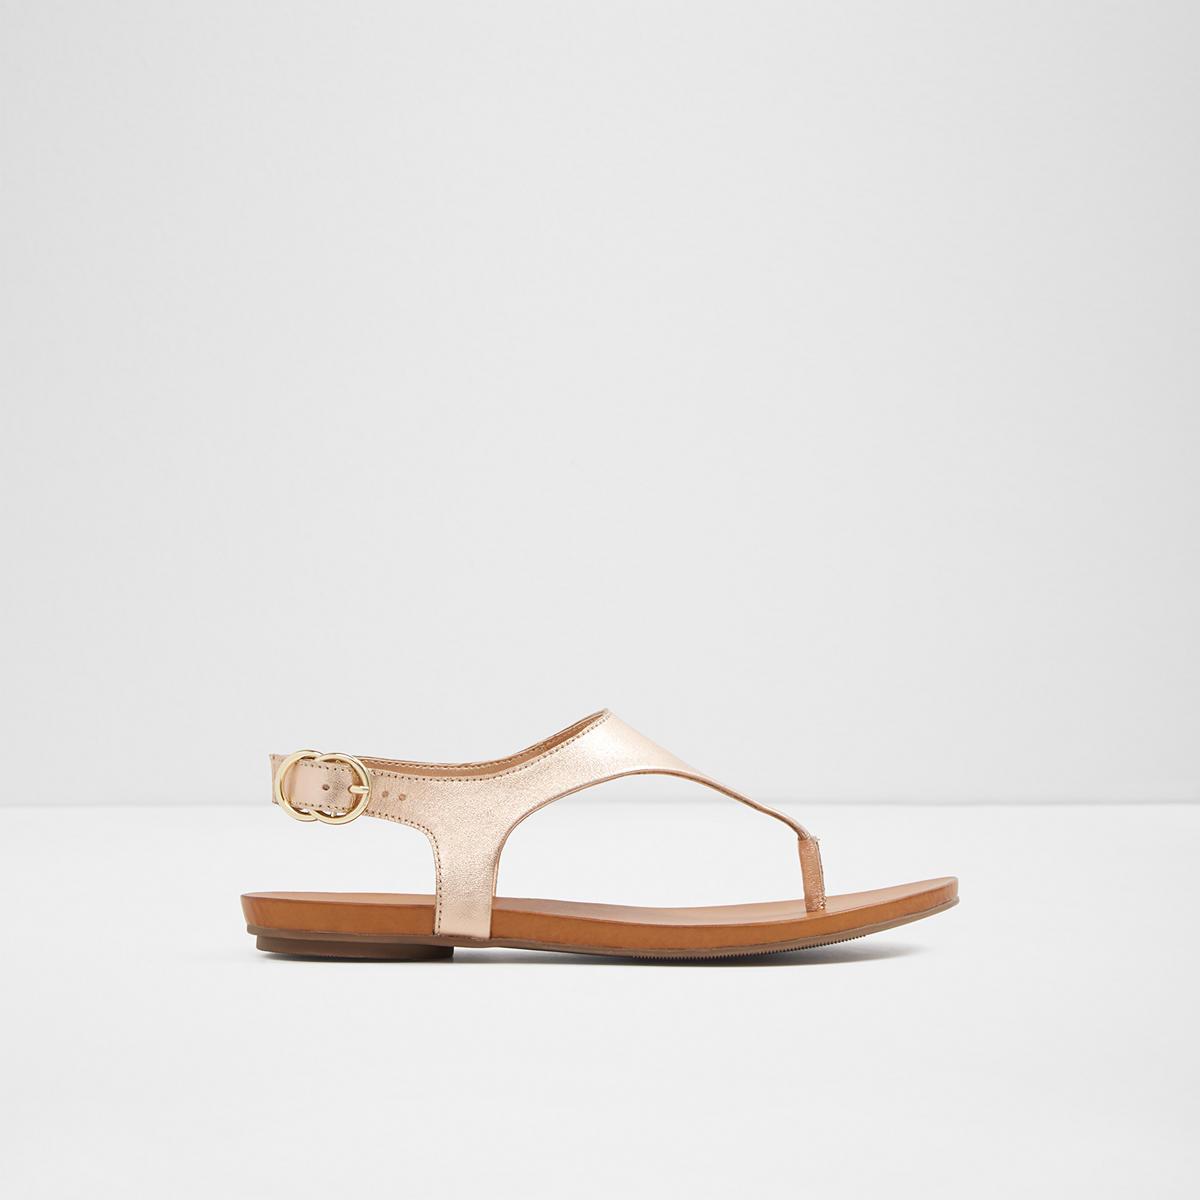 a7d92649f5b1 Jerilassi Metallic Misc. Women s Sandals